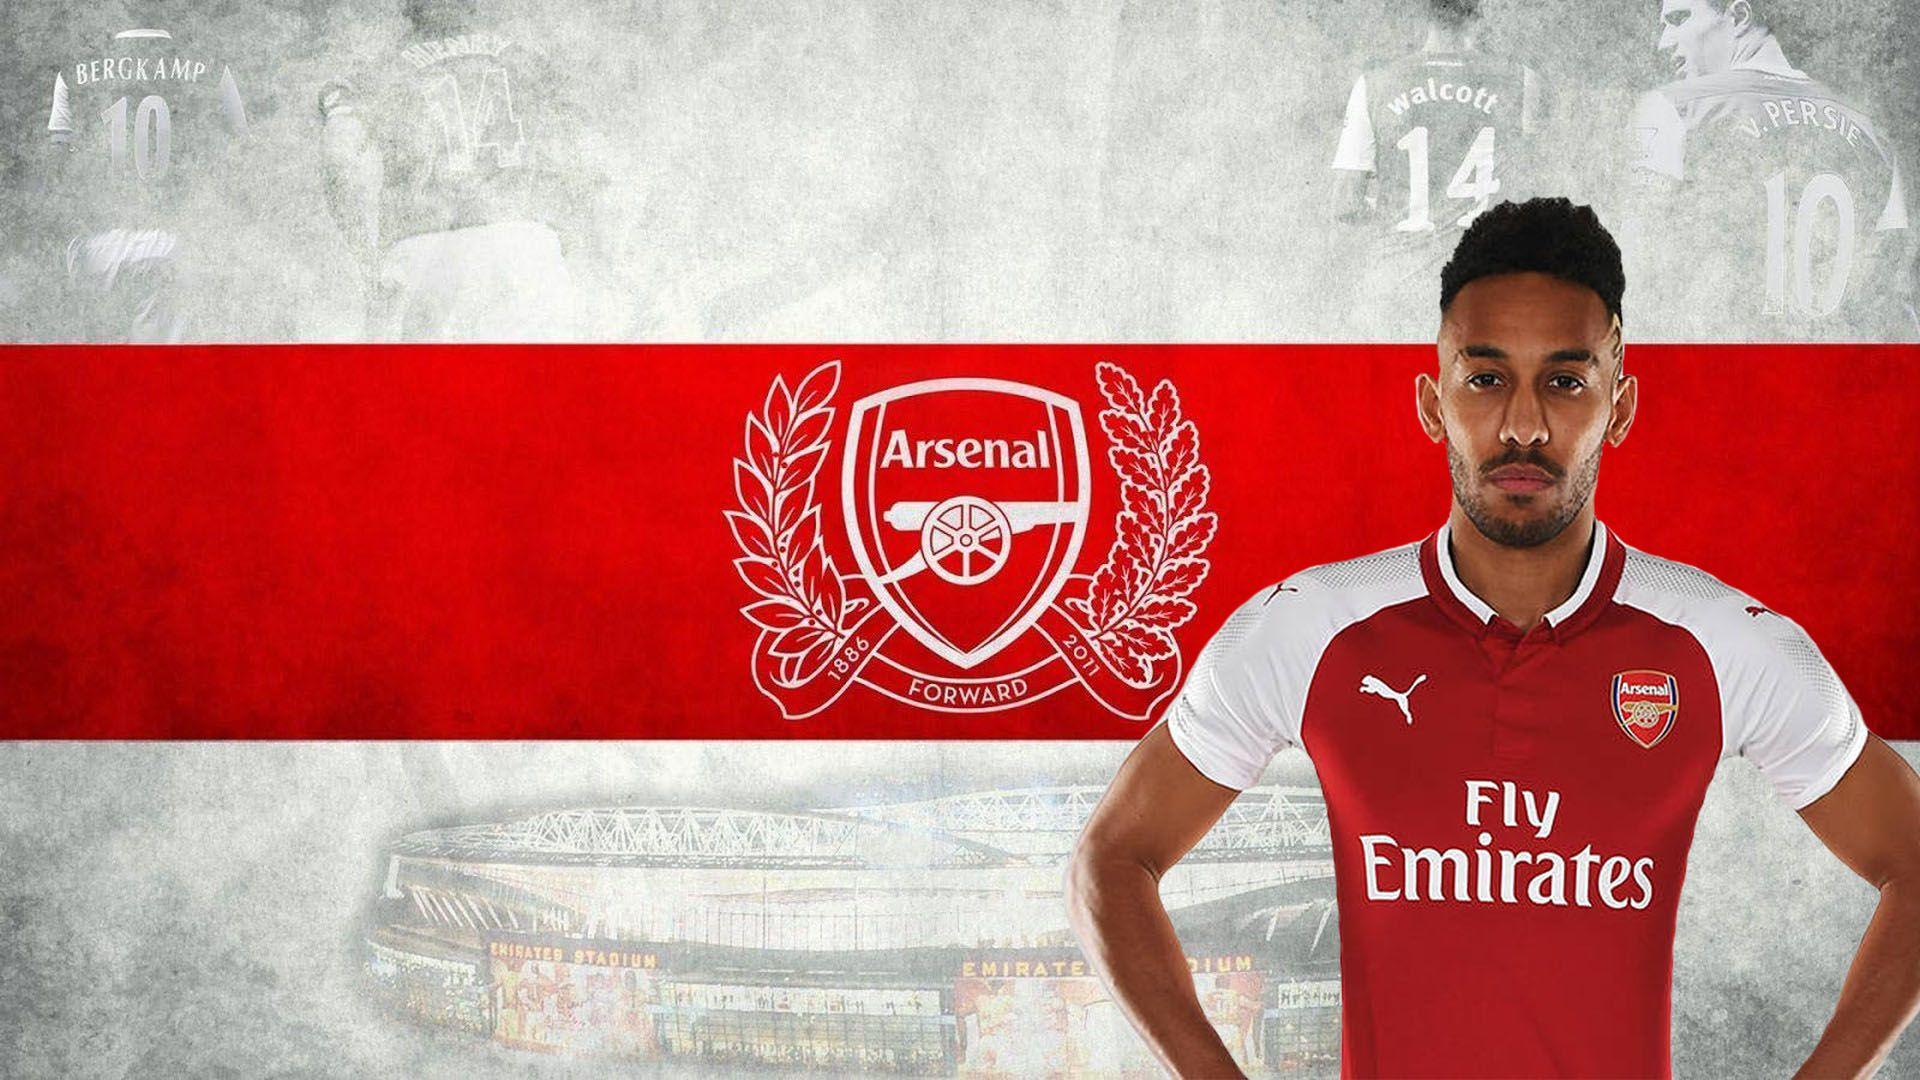 Wallpaper Aubameyang Arsenal Aubameyang Arsenal Arsenal